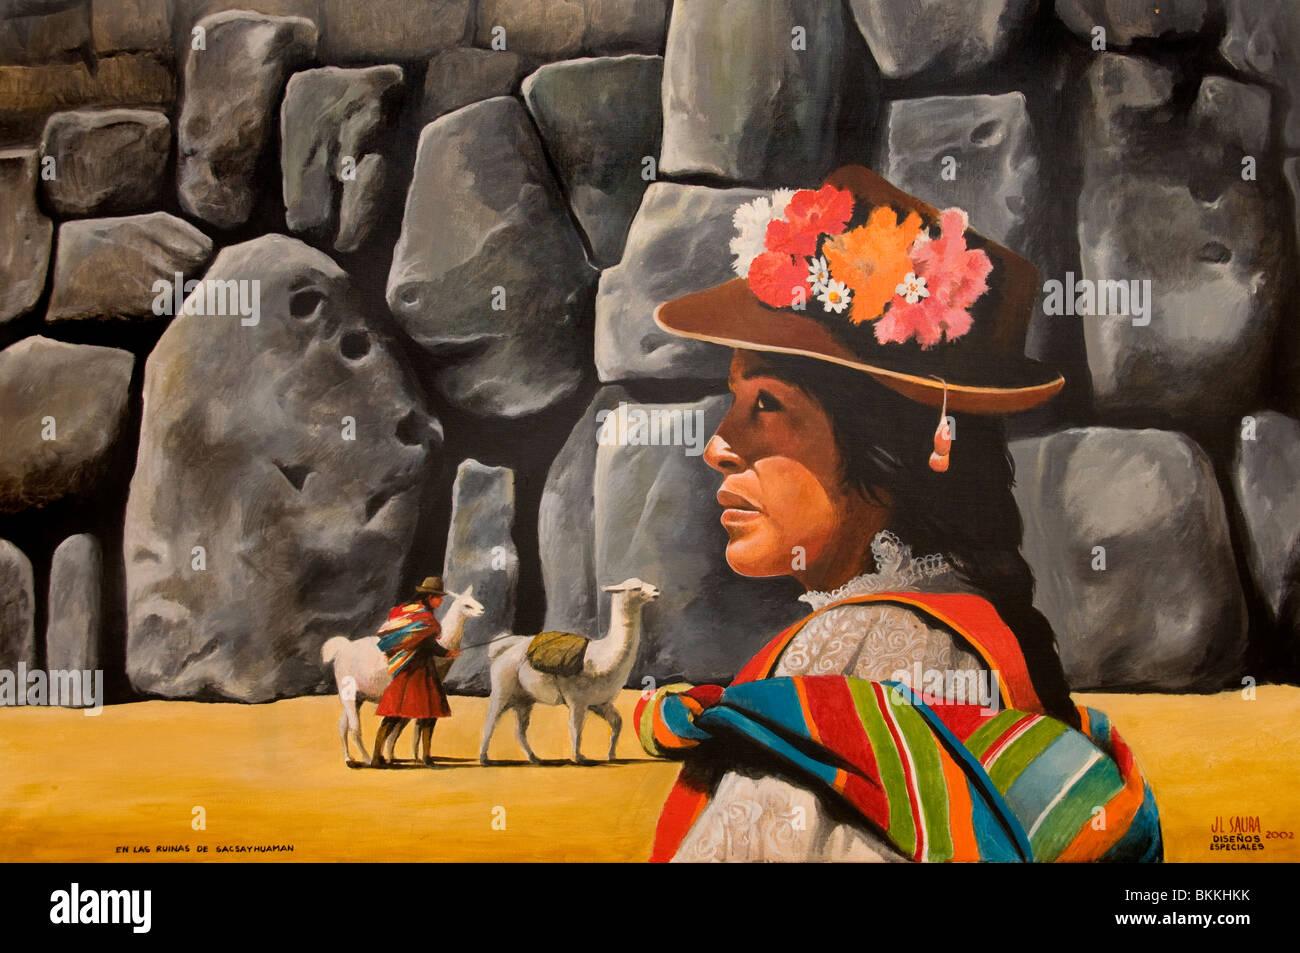 Peru Peruvian South America Indian Painting Lama - Stock Image